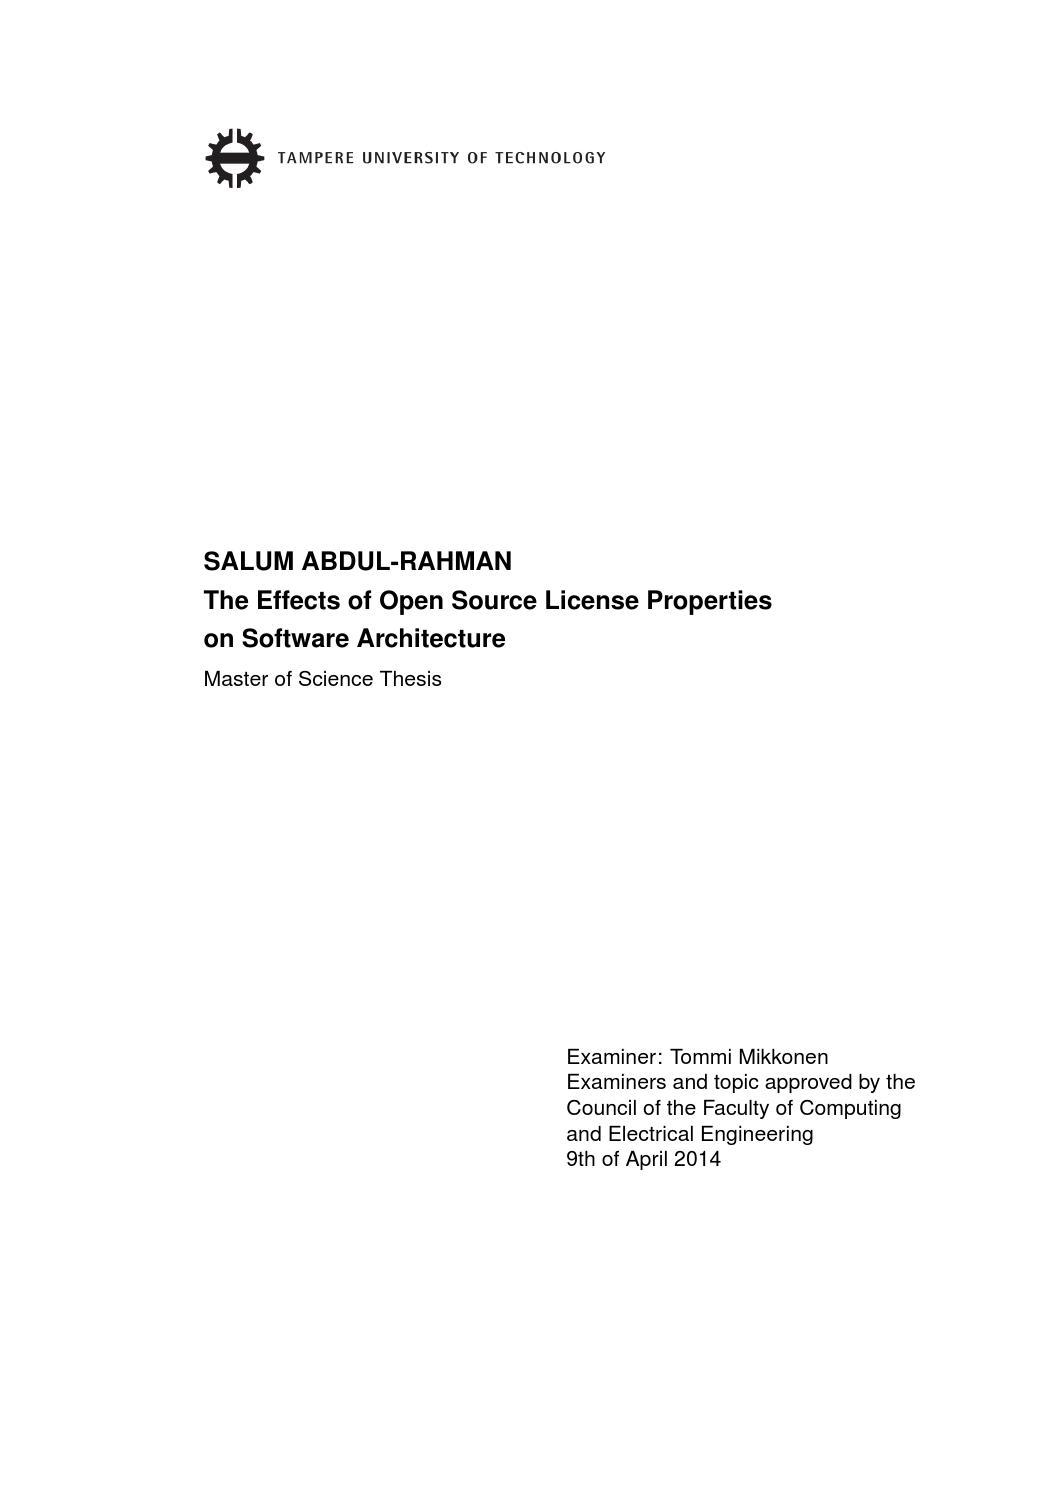 Salum Abdul-Rahman by Gofore - issuu